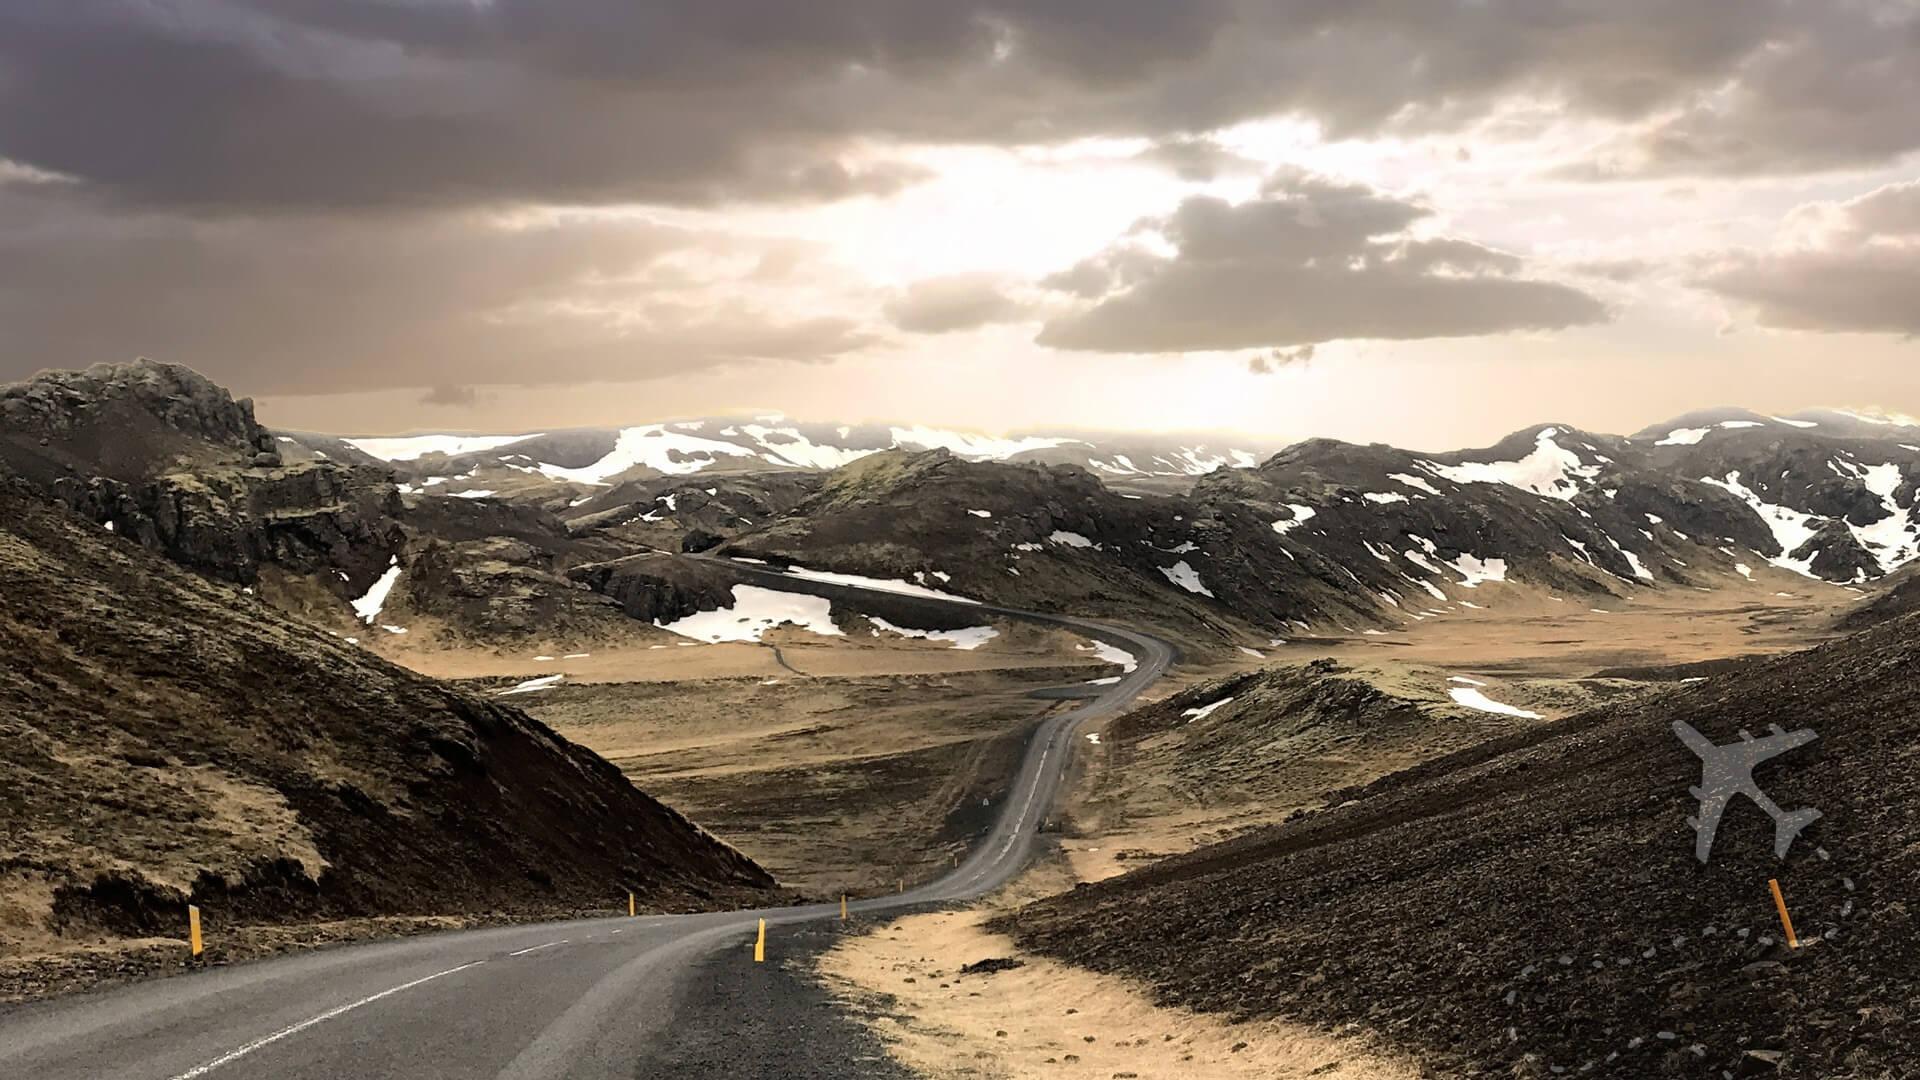 Iceland's volcanic landscape